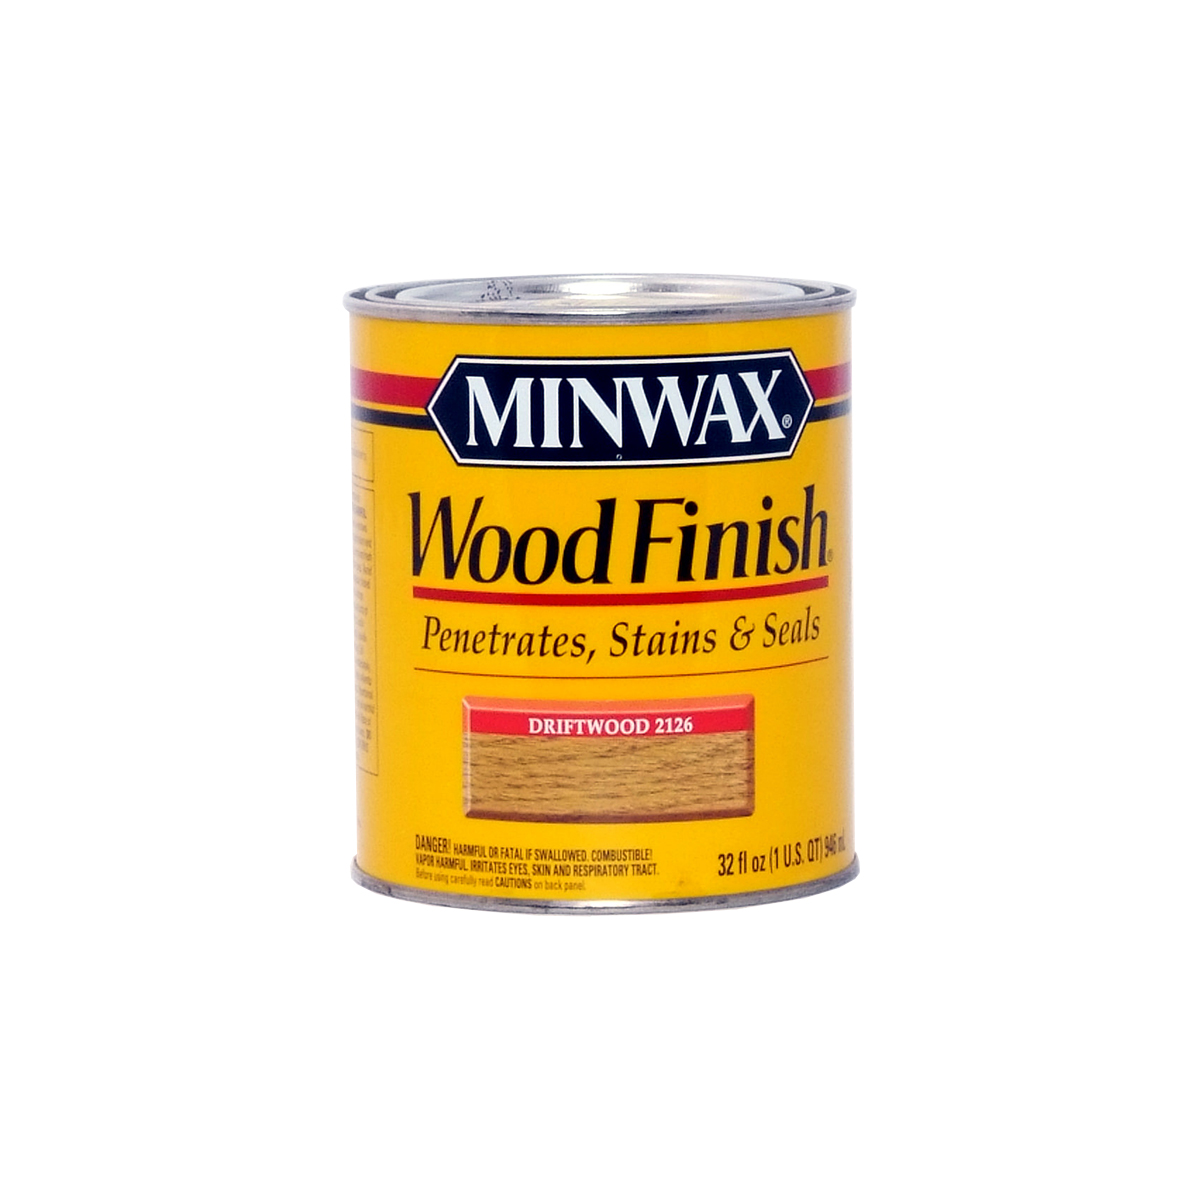 Minwax Driftwood 2126 Stain   Quart